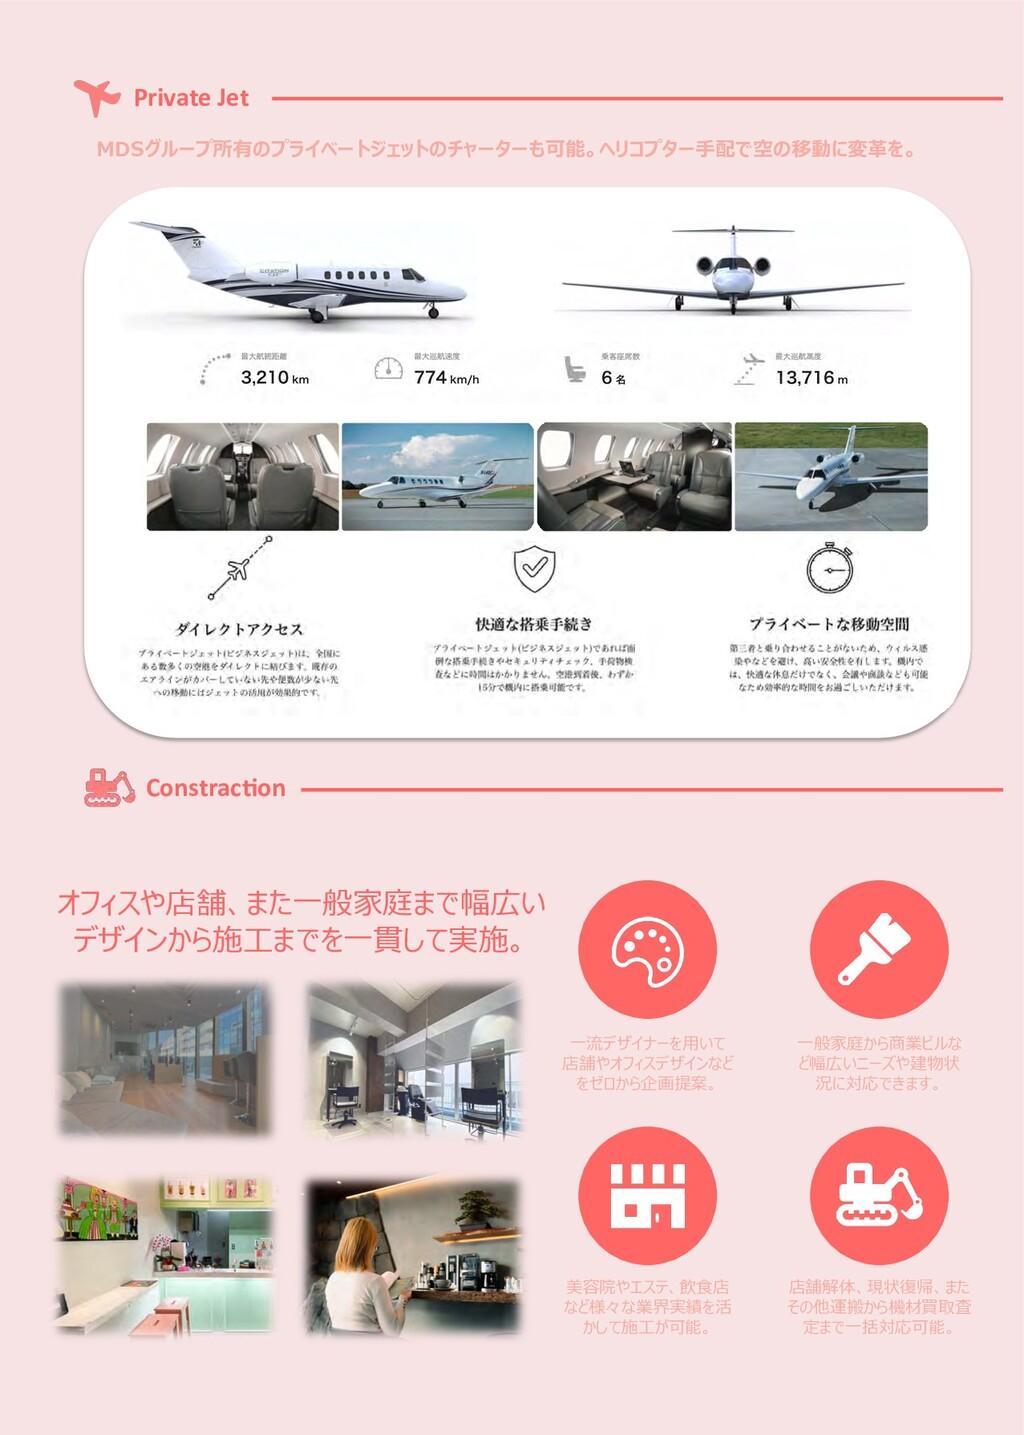 Private Jet Constrac<on MDSグループ所有のプライベートジェットのチャ...